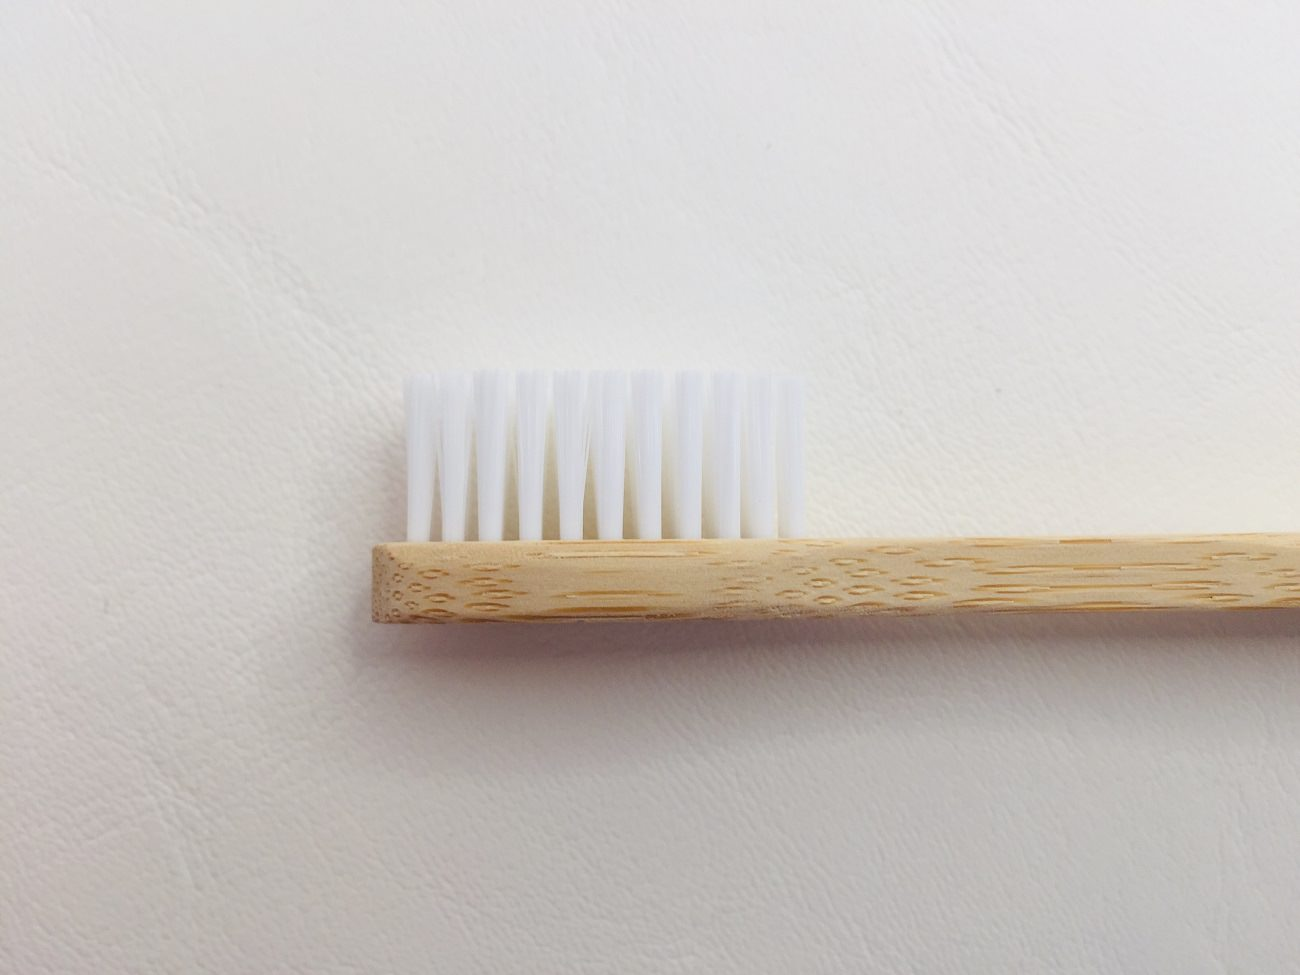 Flora & Fauna bamboo Toothbrush nylon bristles are soft